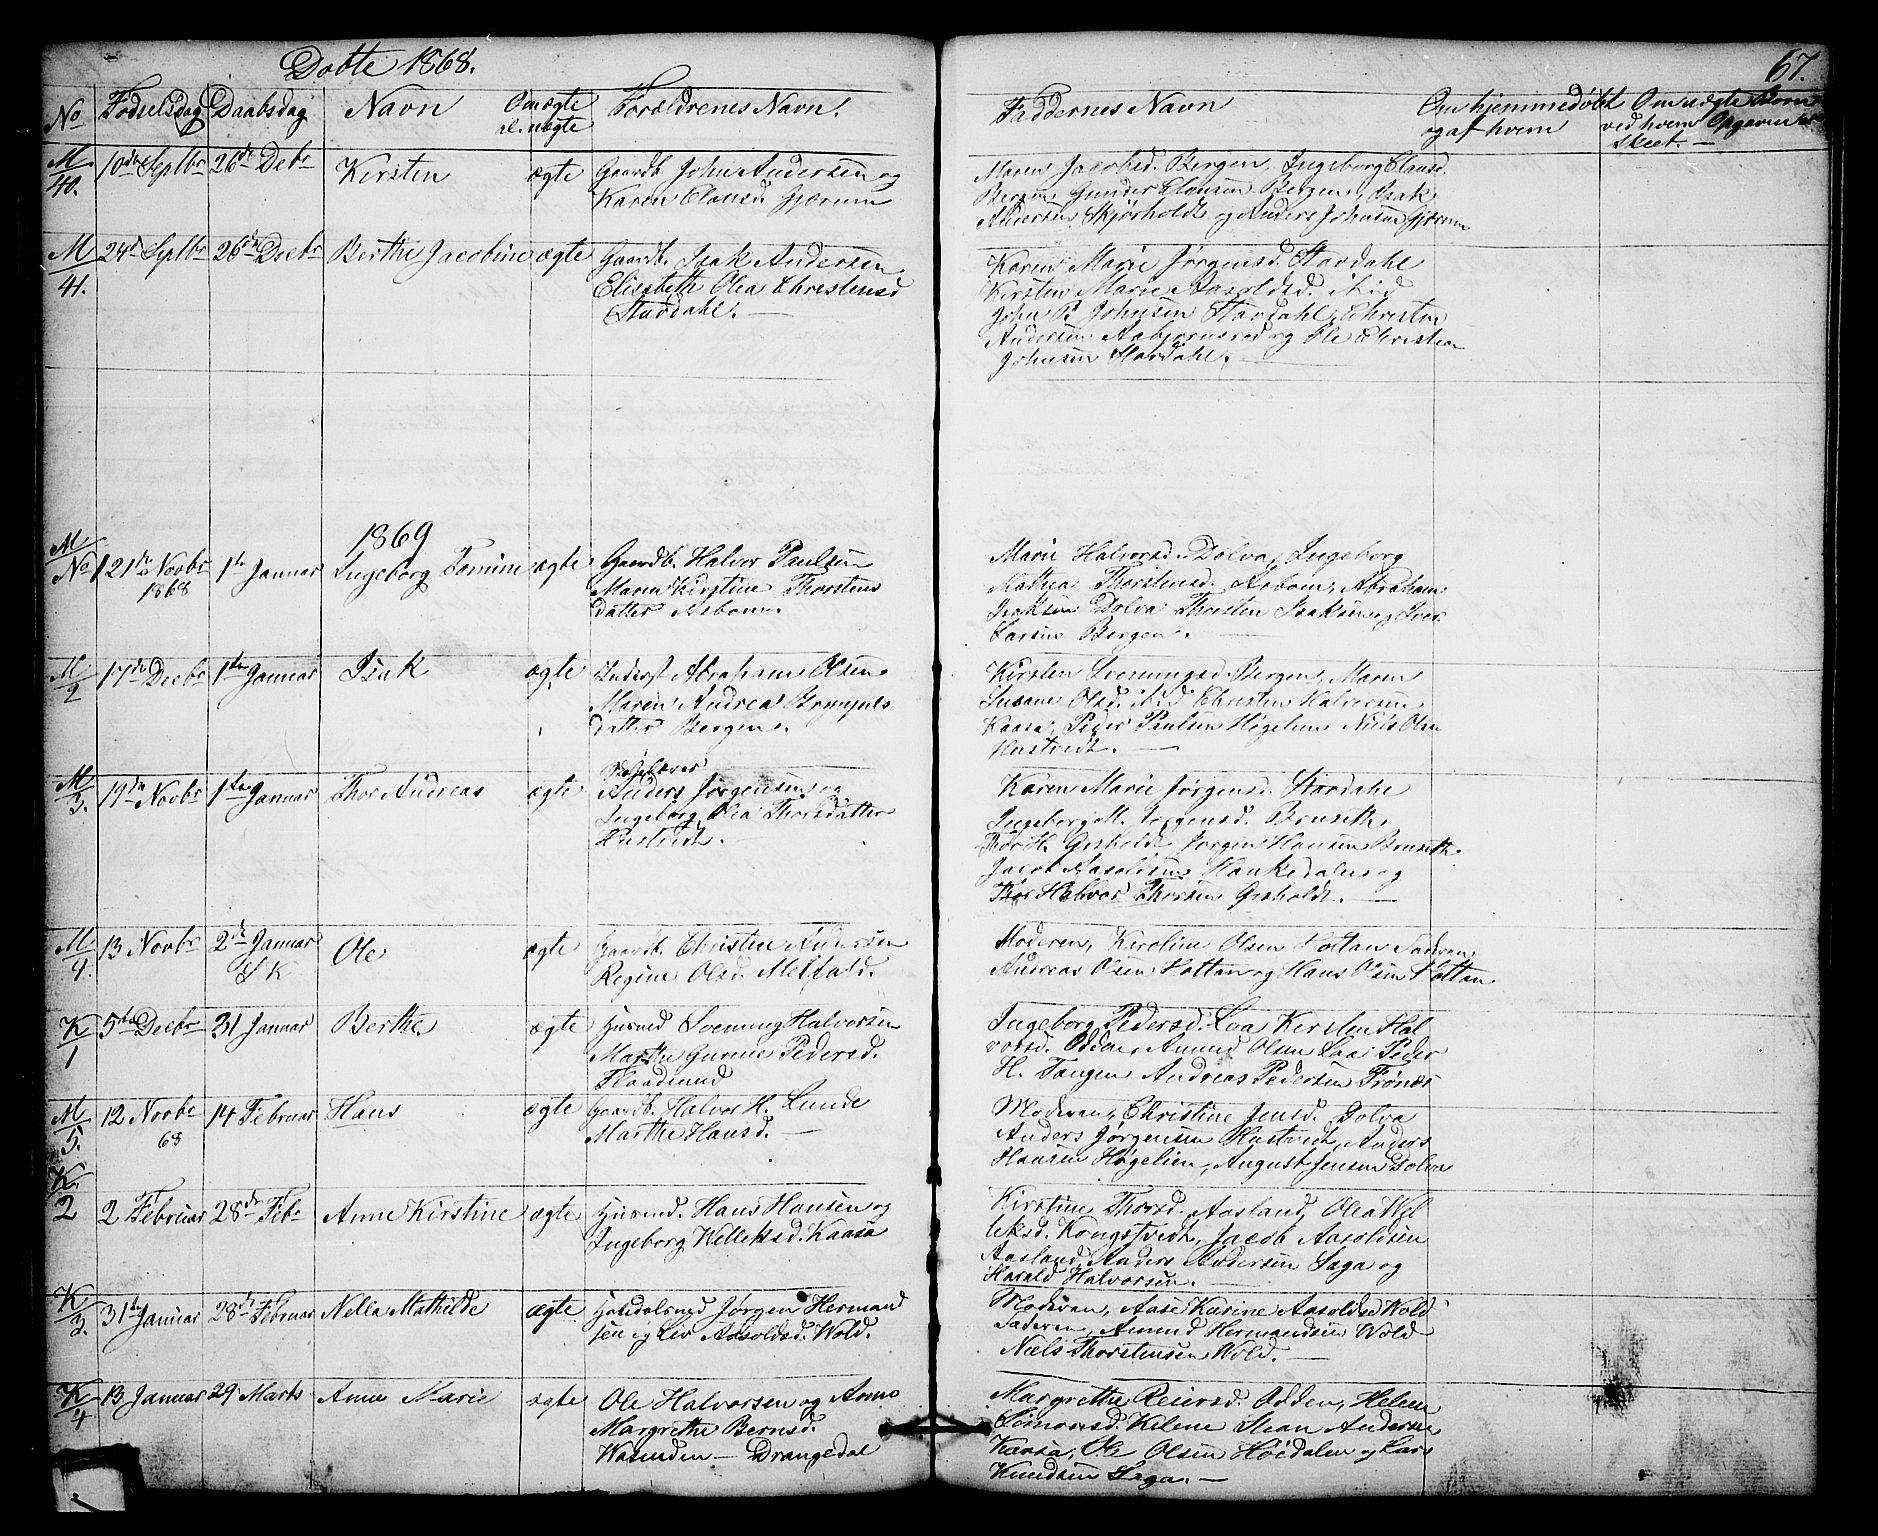 SAKO, Solum kirkebøker, G/Gb/L0002: Klokkerbok nr. II 2, 1859-1879, s. 67